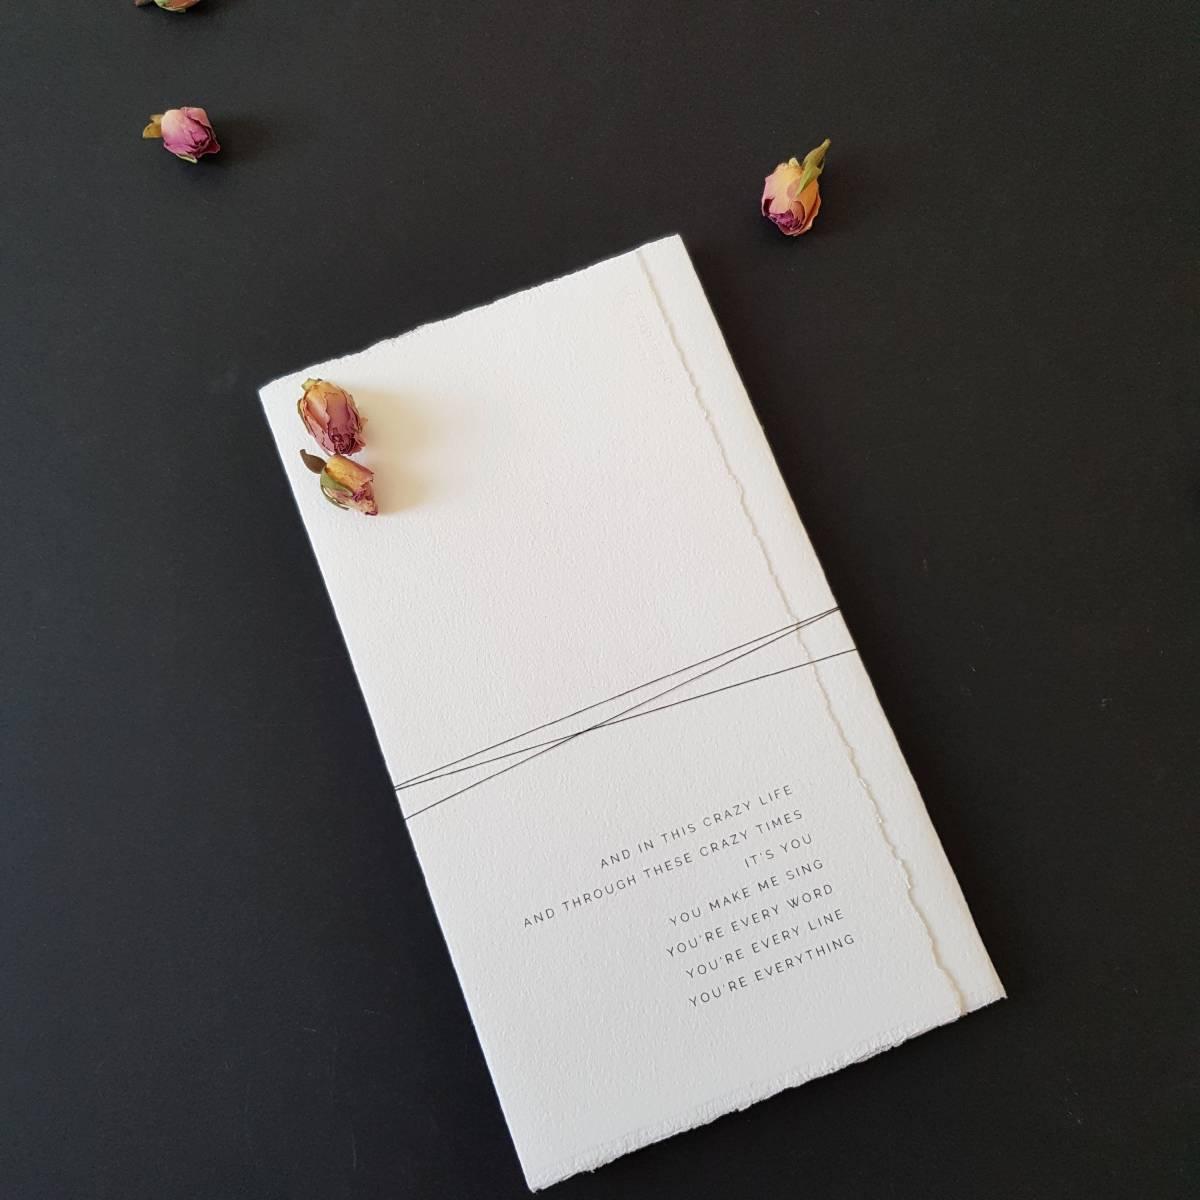 Touch of Gold - Trouwuitnodiging - Huwelijksuitnodiging - Kalligrafie - House of Weddings - 11